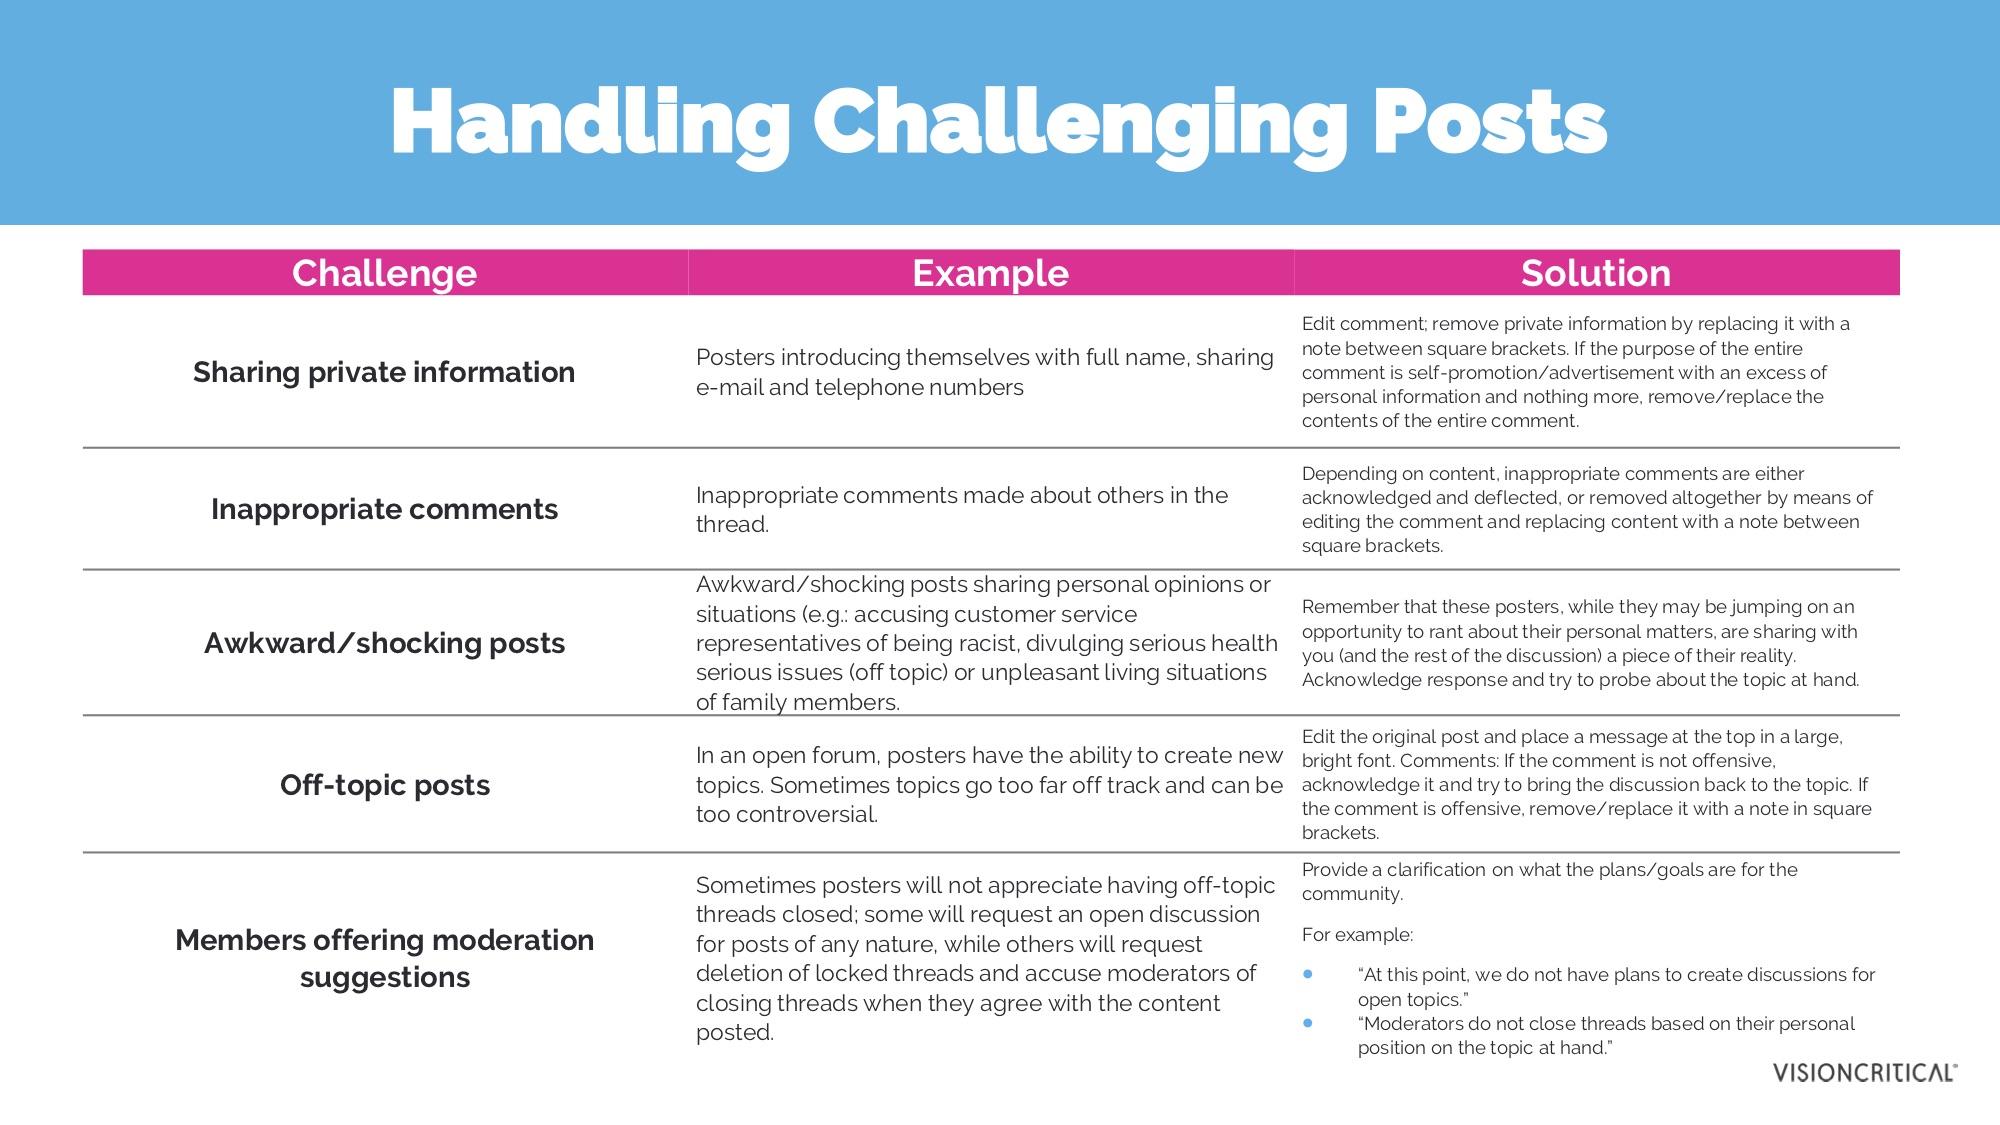 Handling Challenging Posts